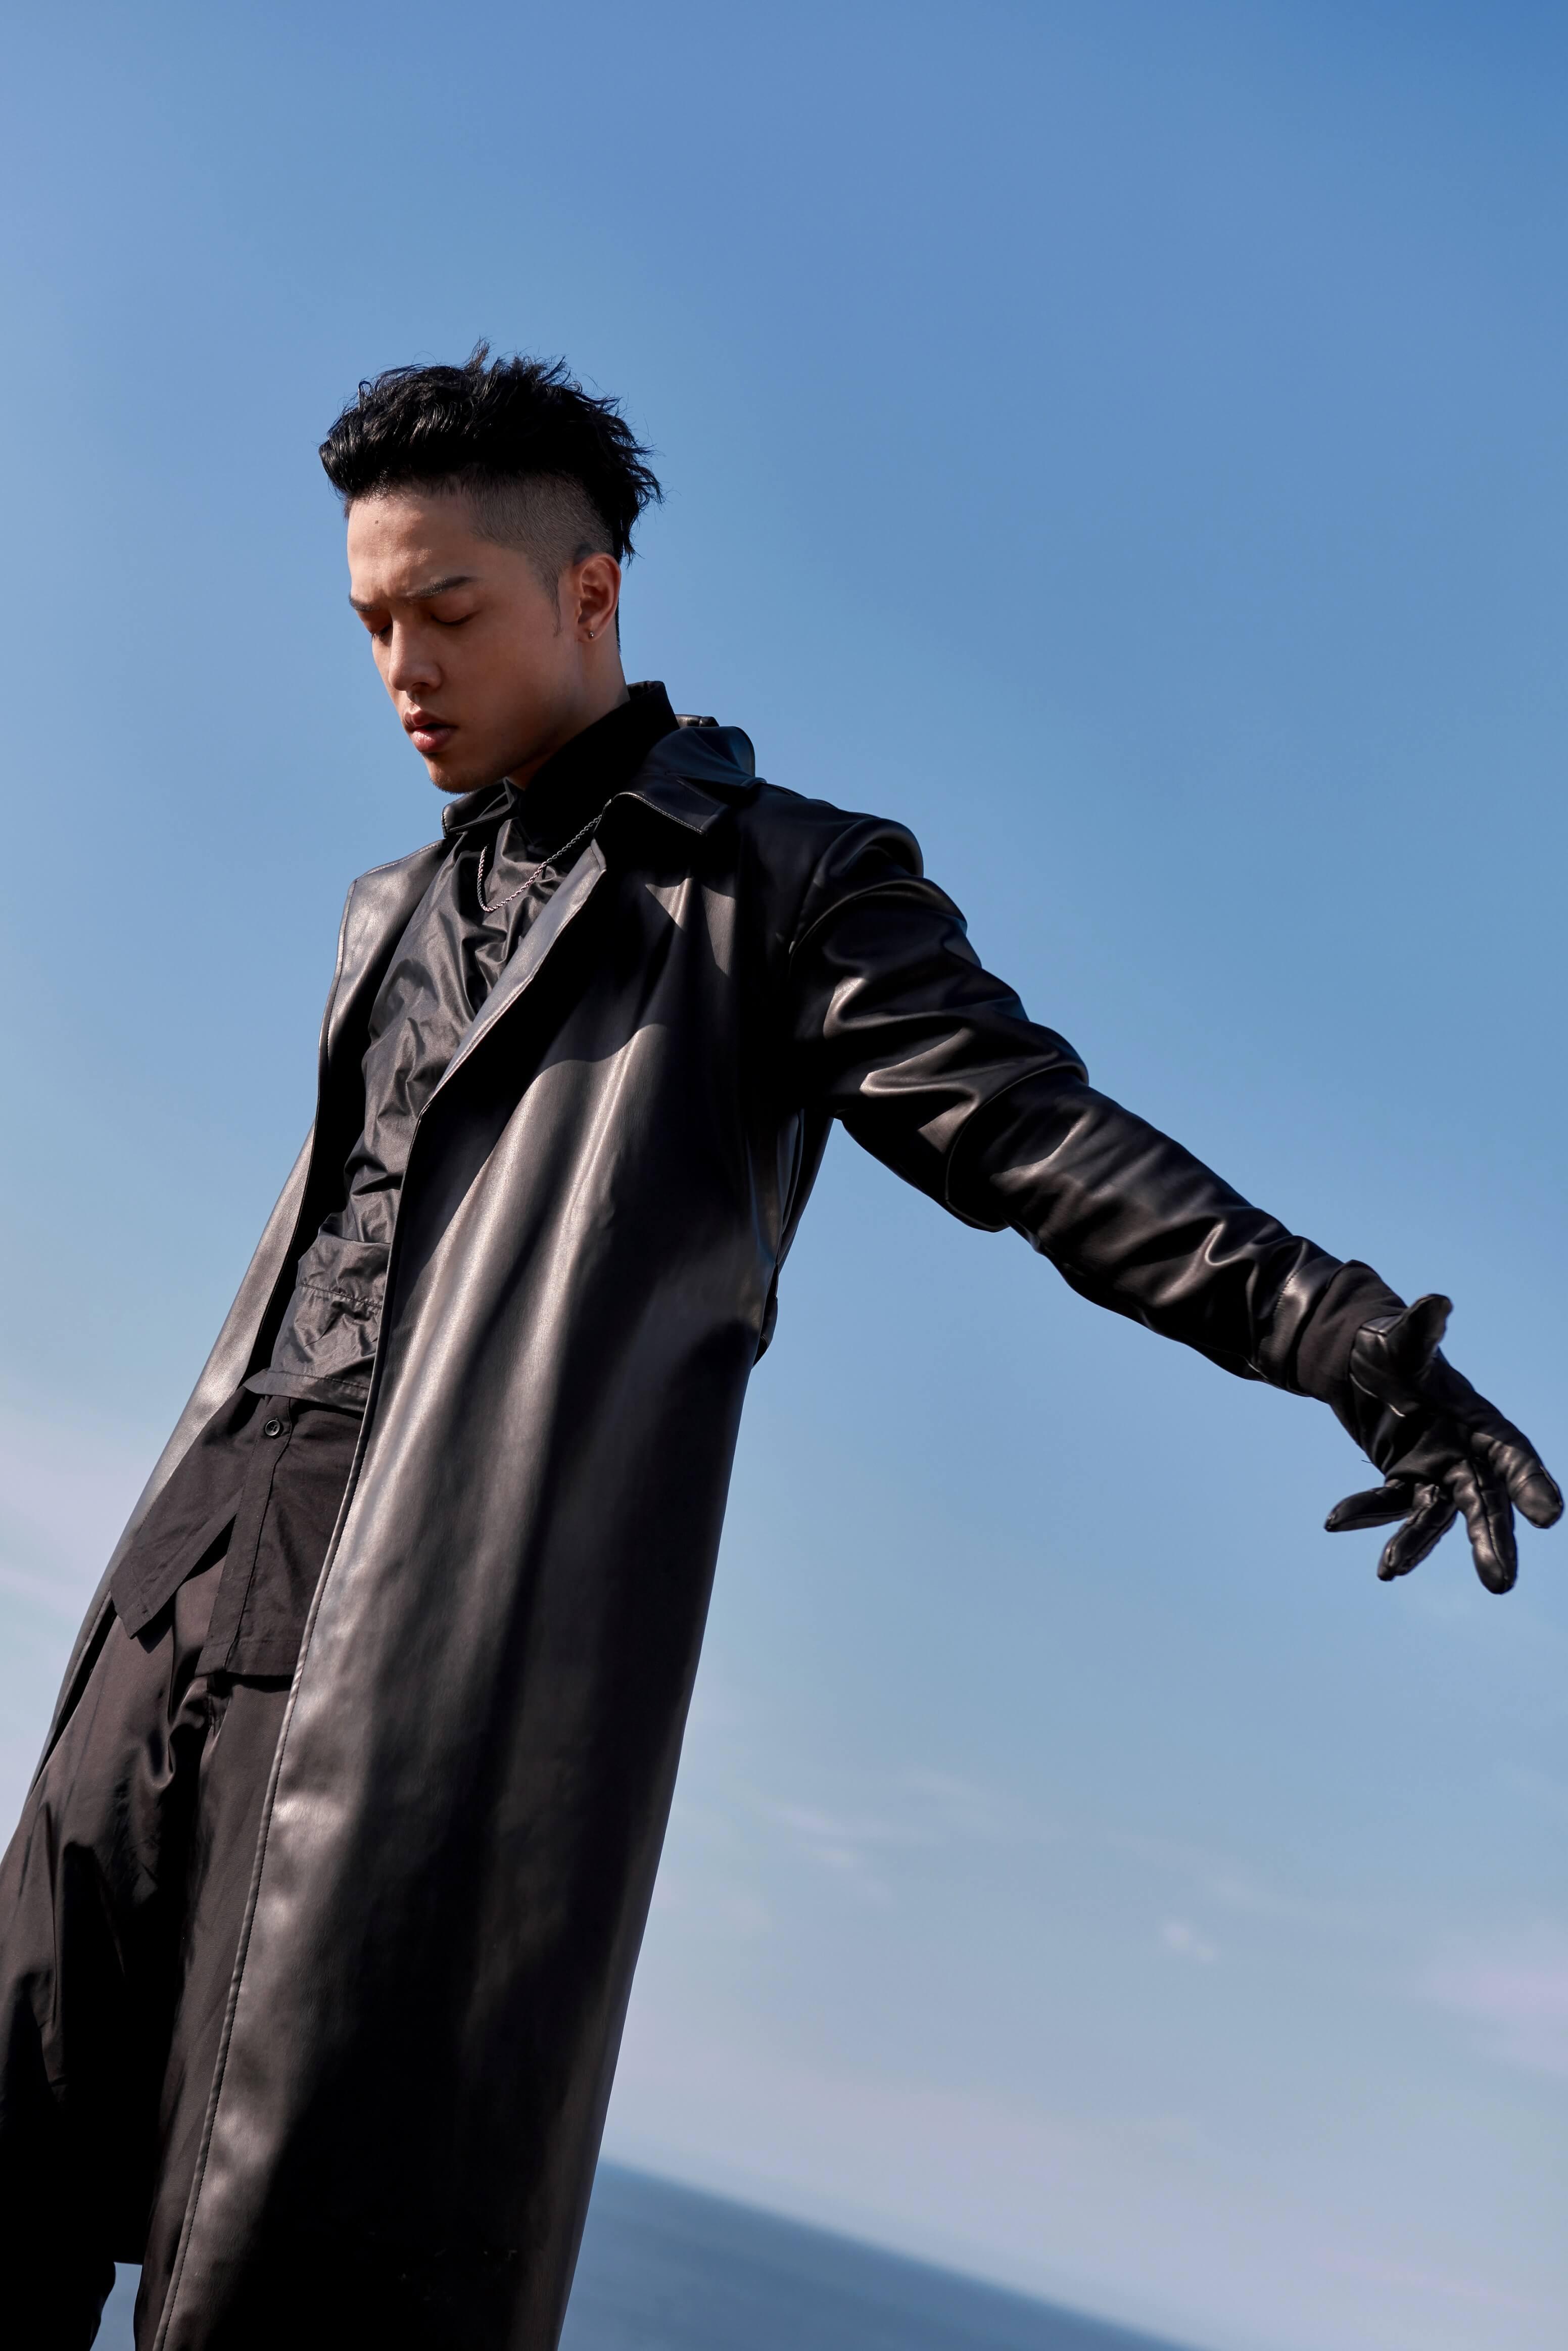 J.Sheon「親自設計單曲封面」 笑稱:我把預算省給導演!